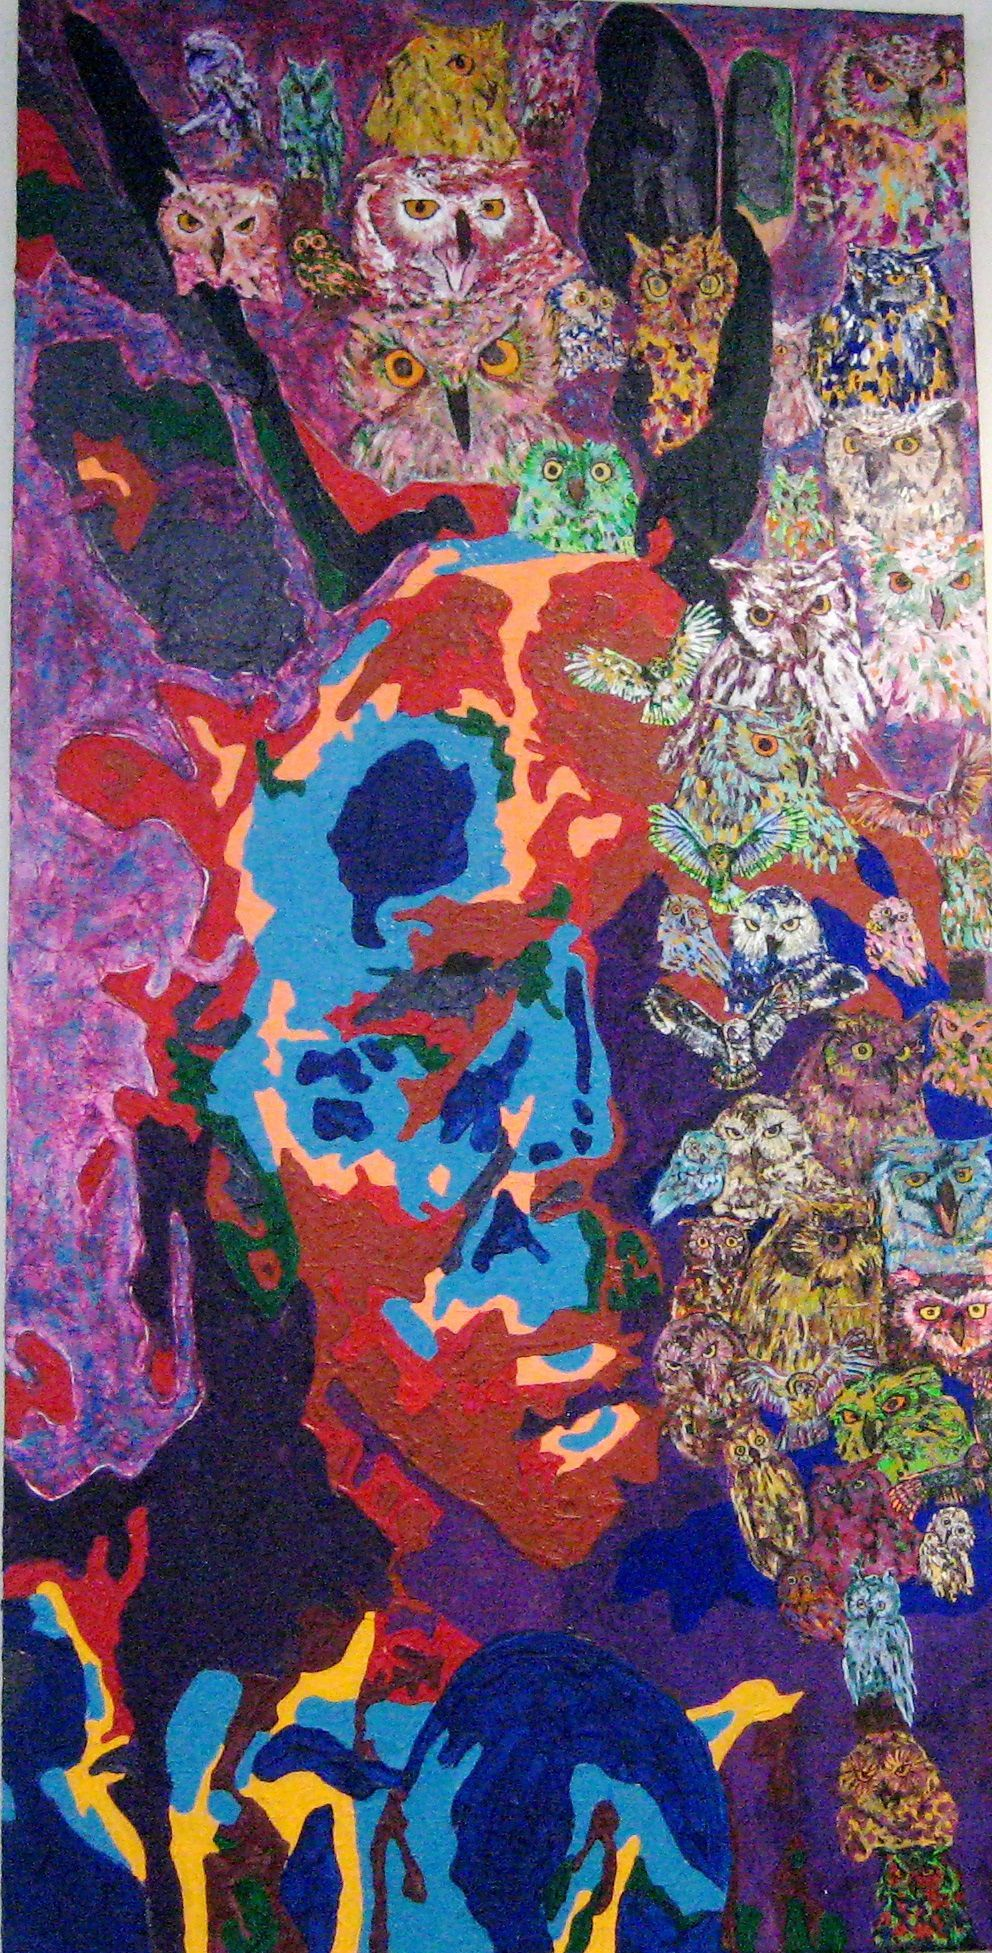 'Chaotyc Wisdom' by Luz H. Gallo